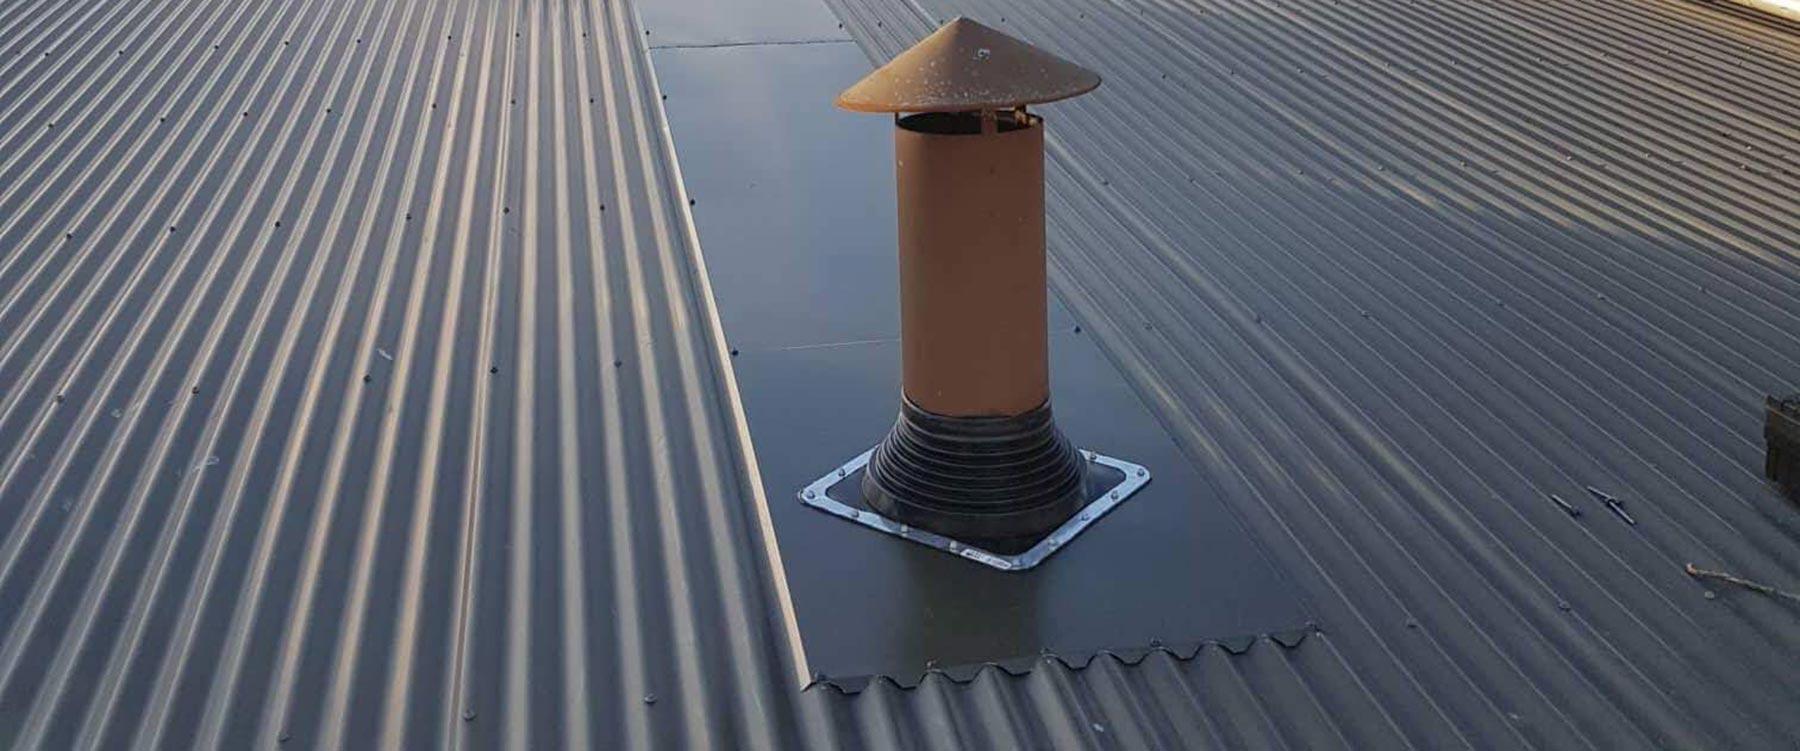 WMR Commercial Roof Repair